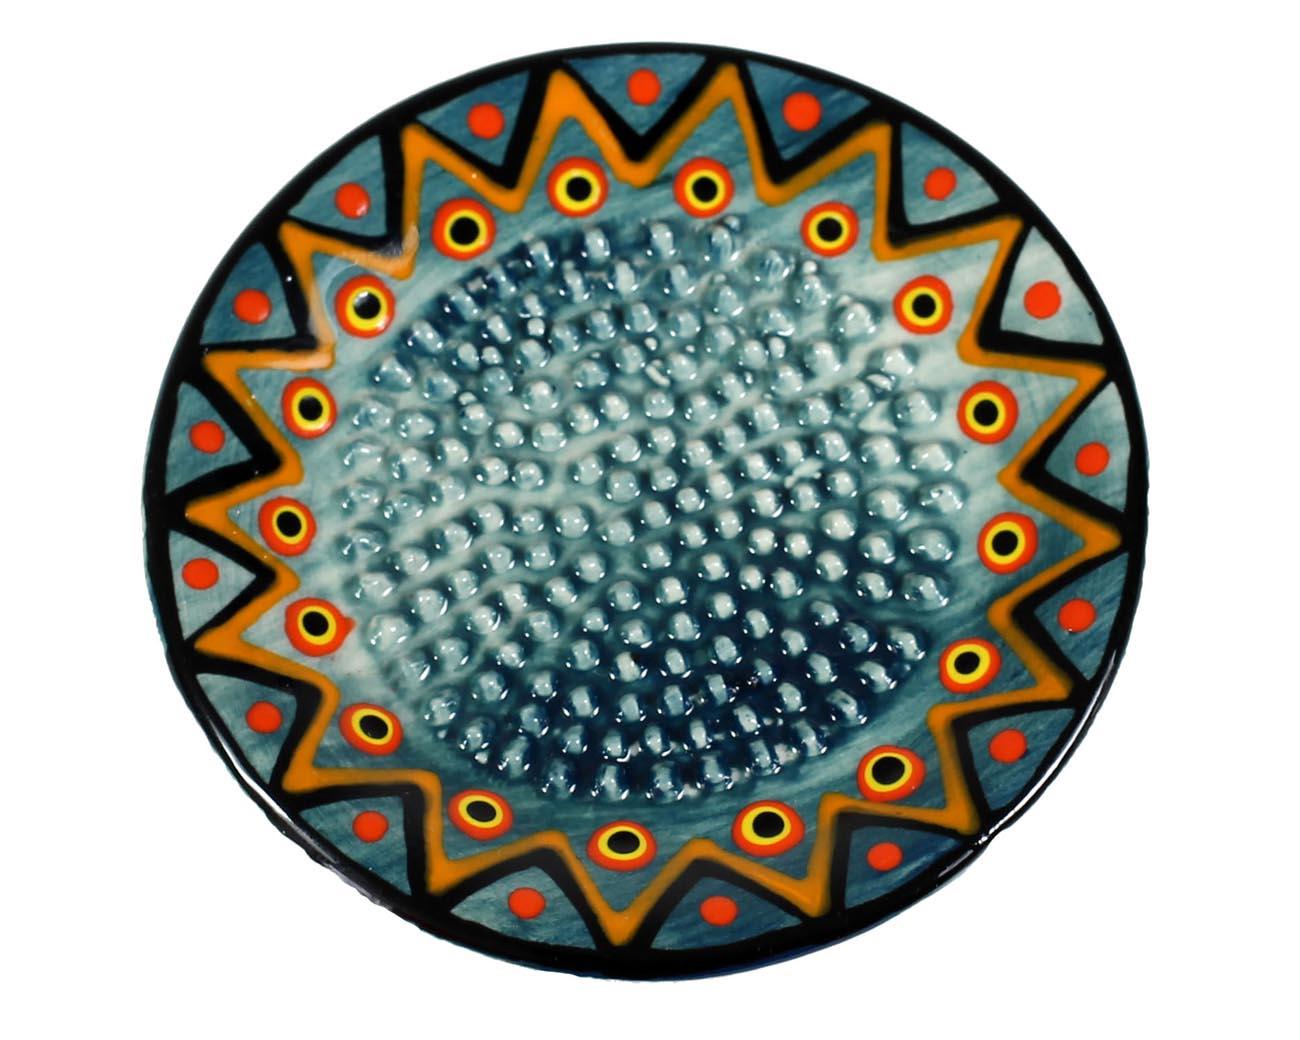 Keramikreibe - Türkiser Ozean C